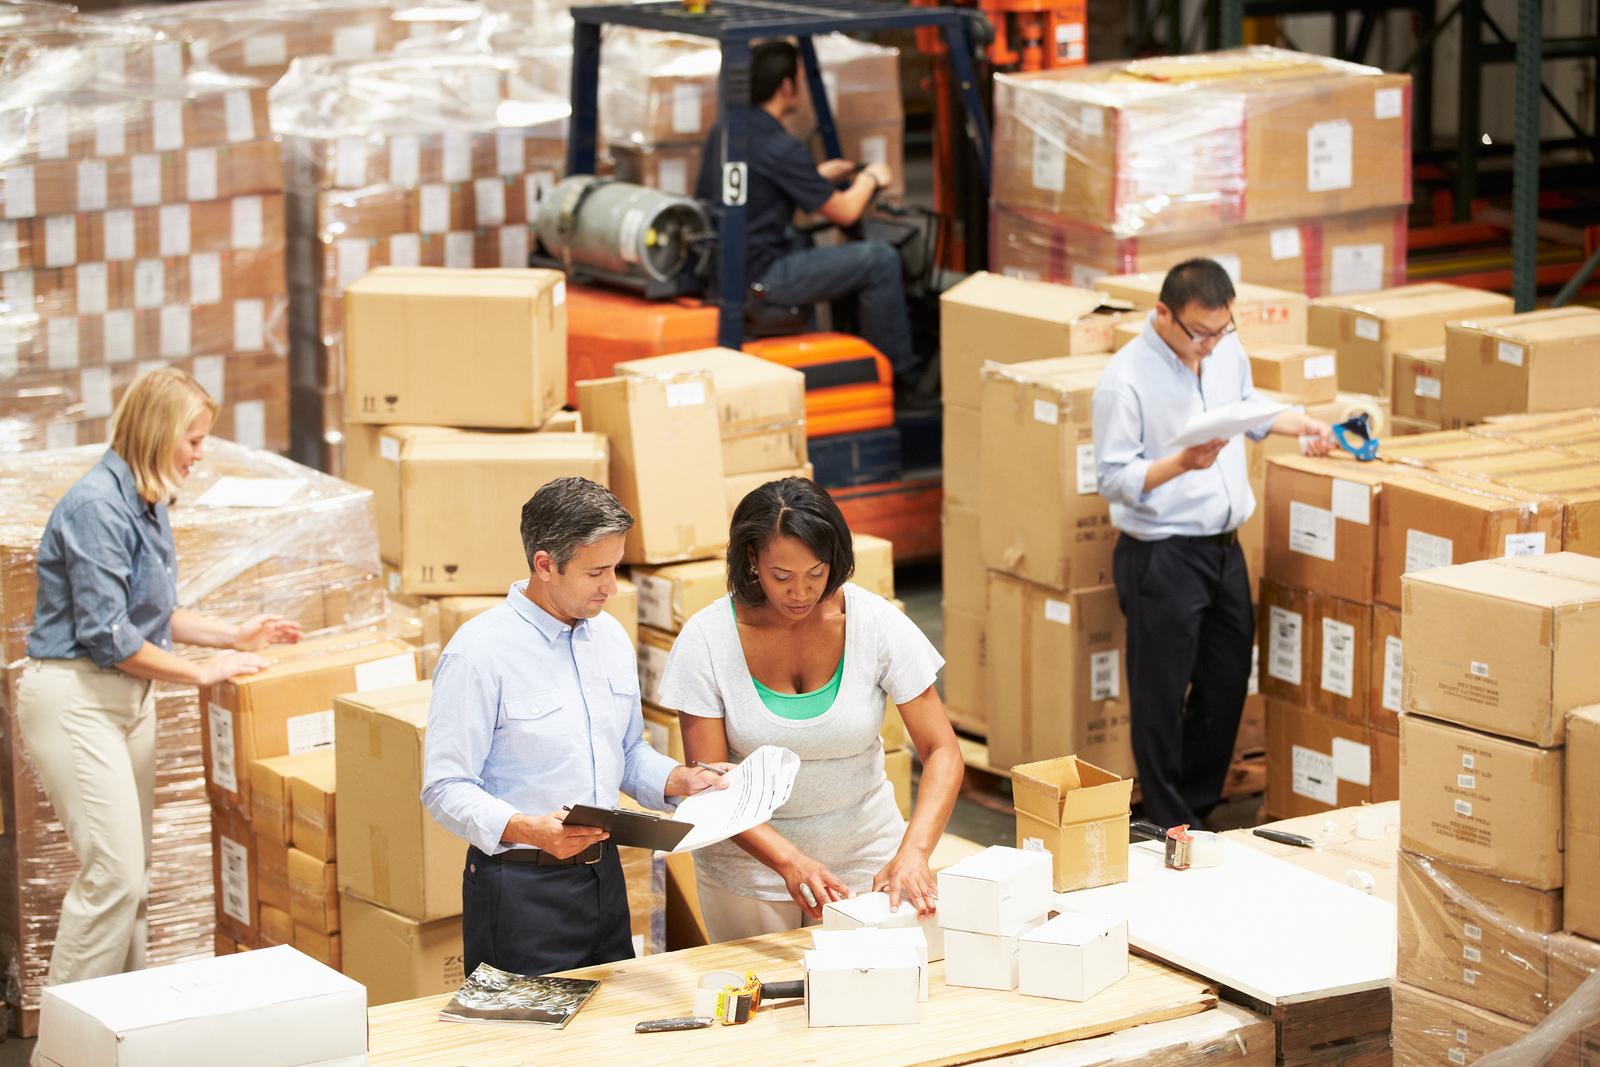 Warehousing Business In Poland